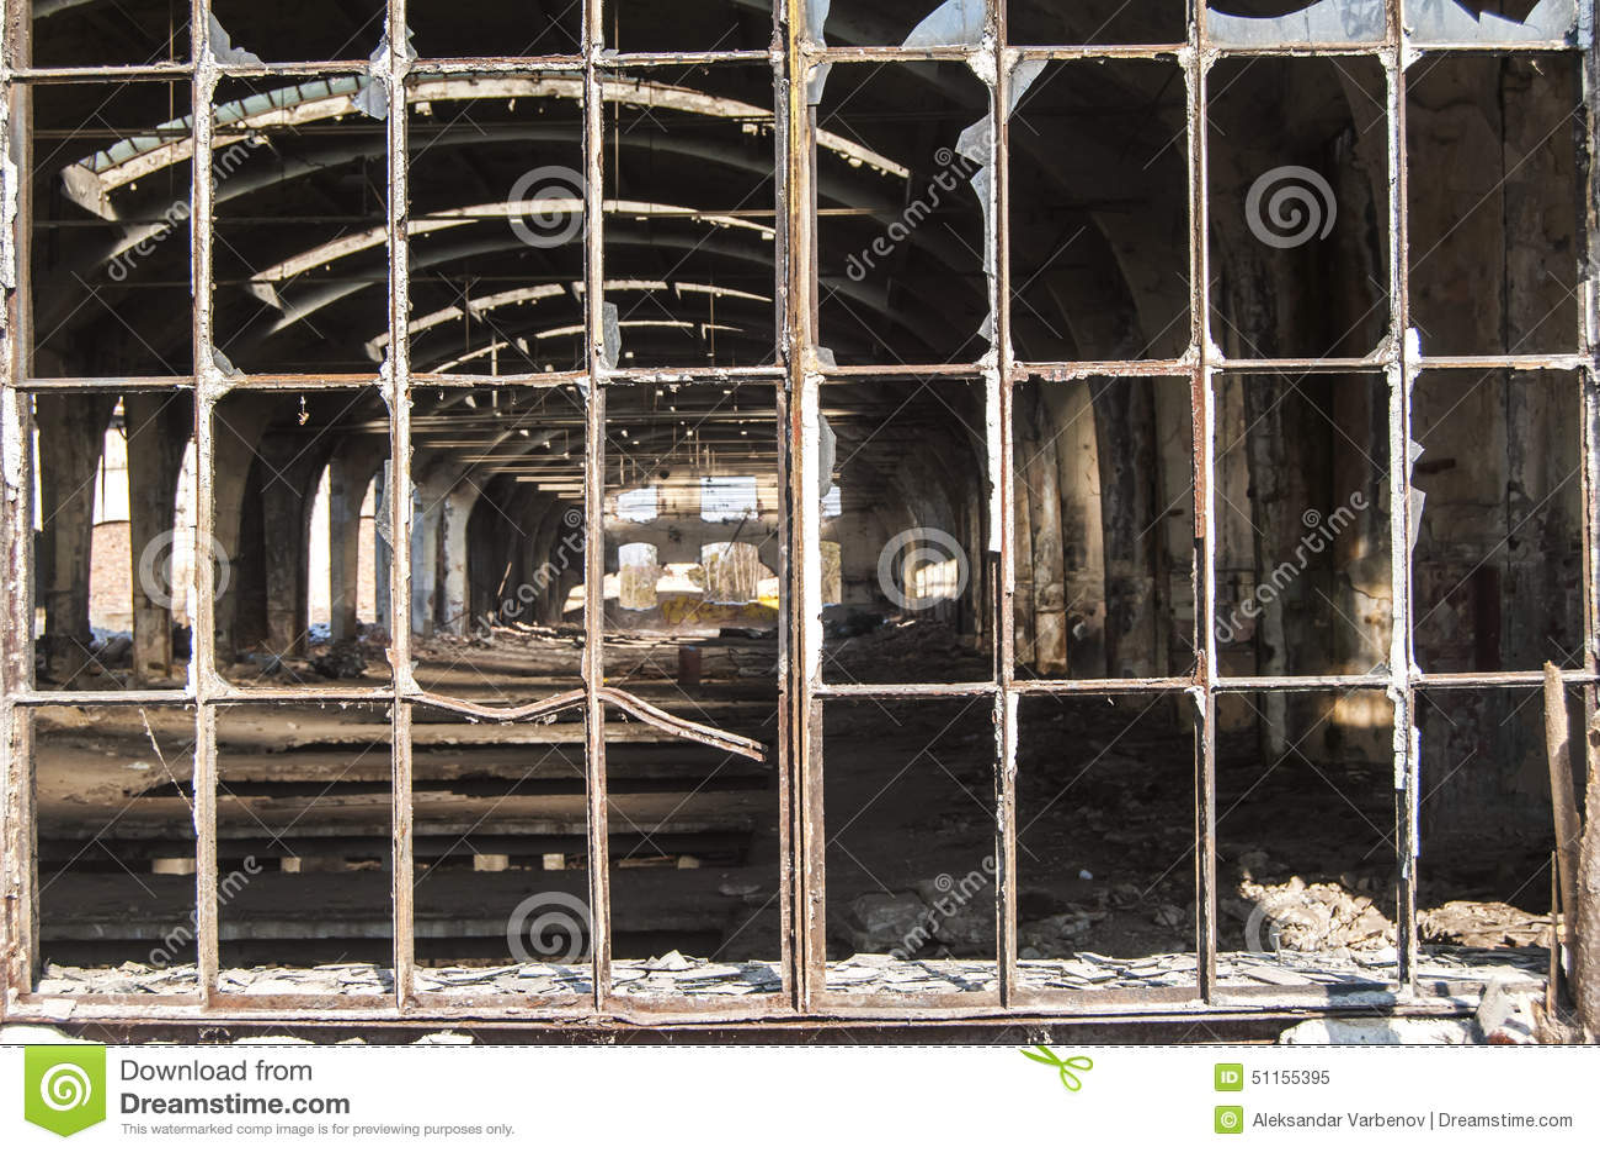 old grunge metal window frame - Metal Window Frames